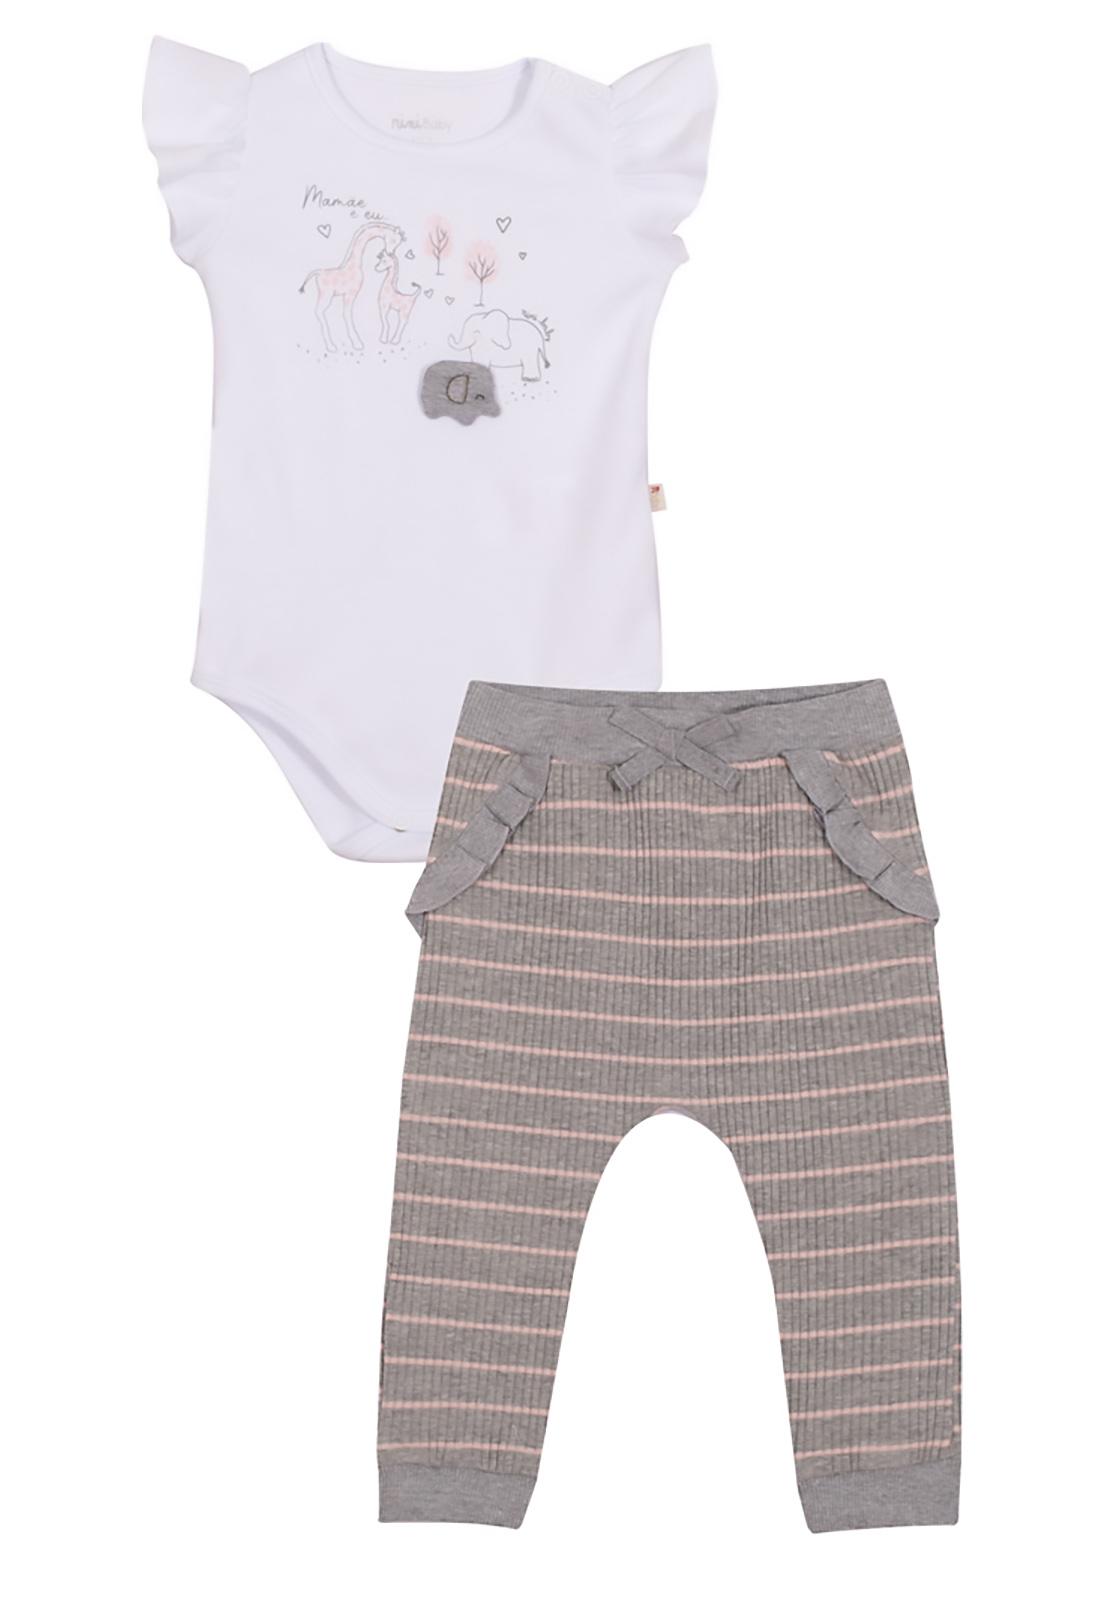 Conjunto Bebê Body e Calça Nini & Bambini Elefantinho Cinza e Branco